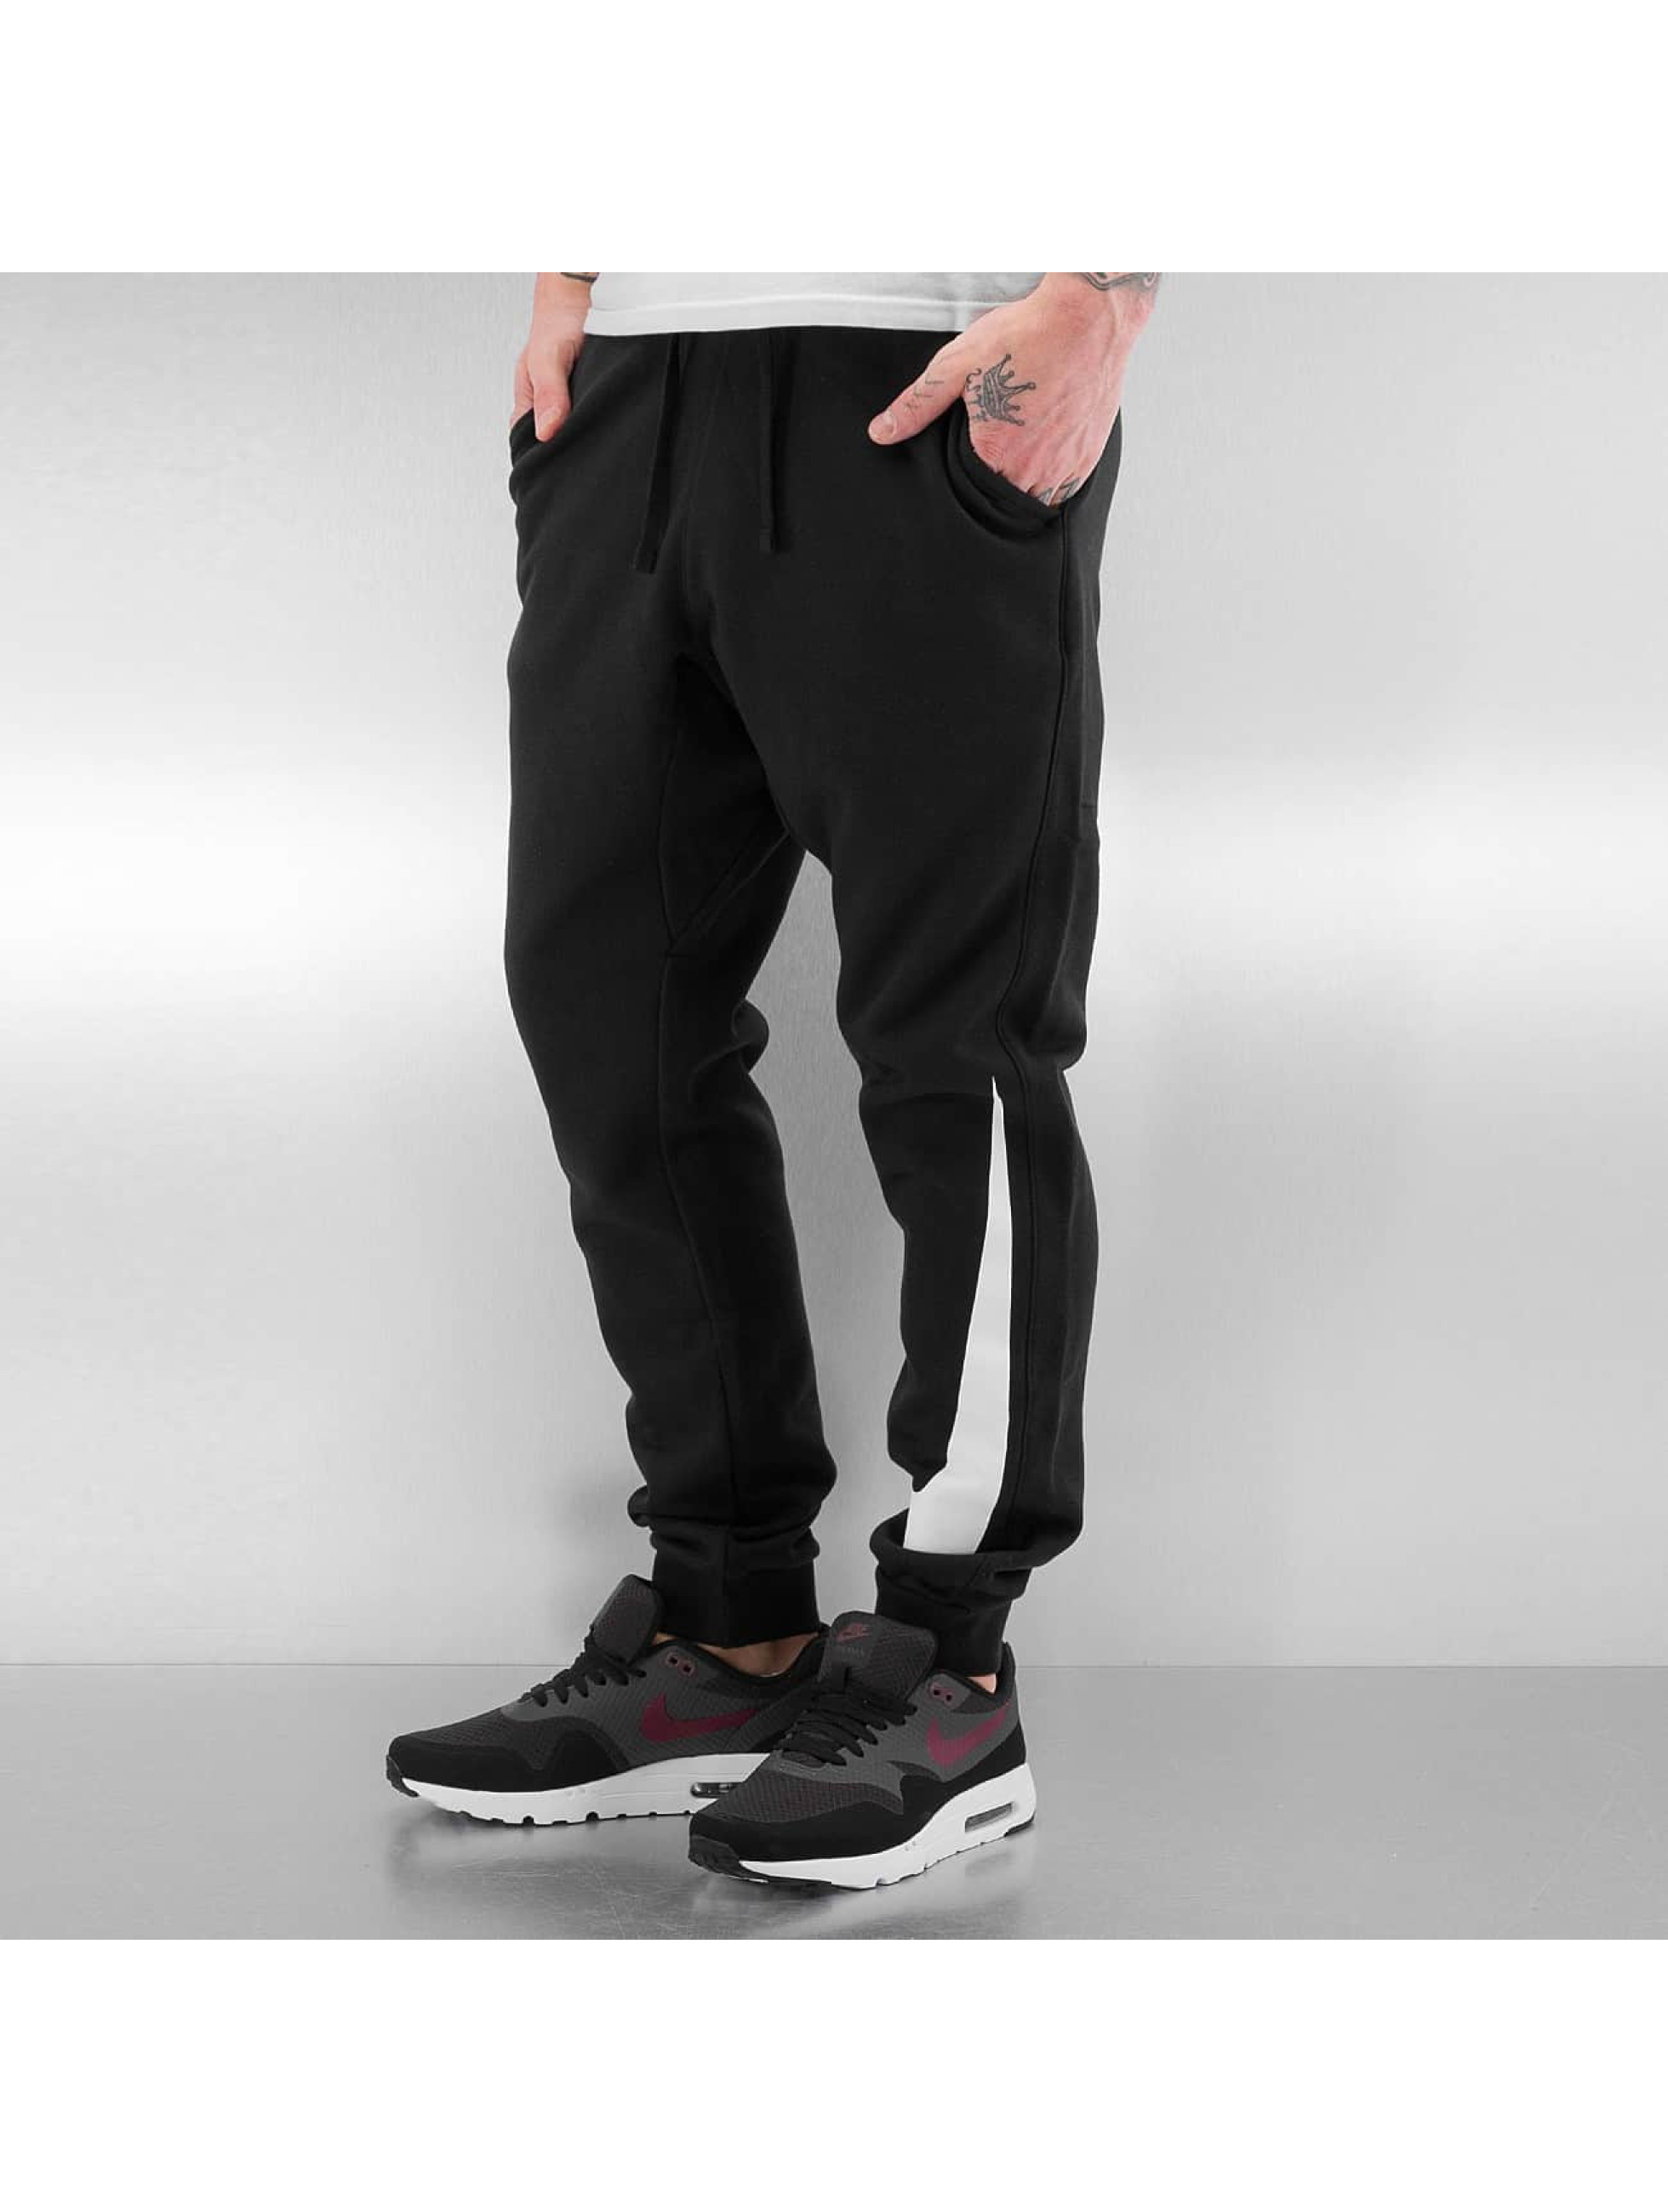 Nike Männer Jogginghose NSW FLC Hybrid in schwarz